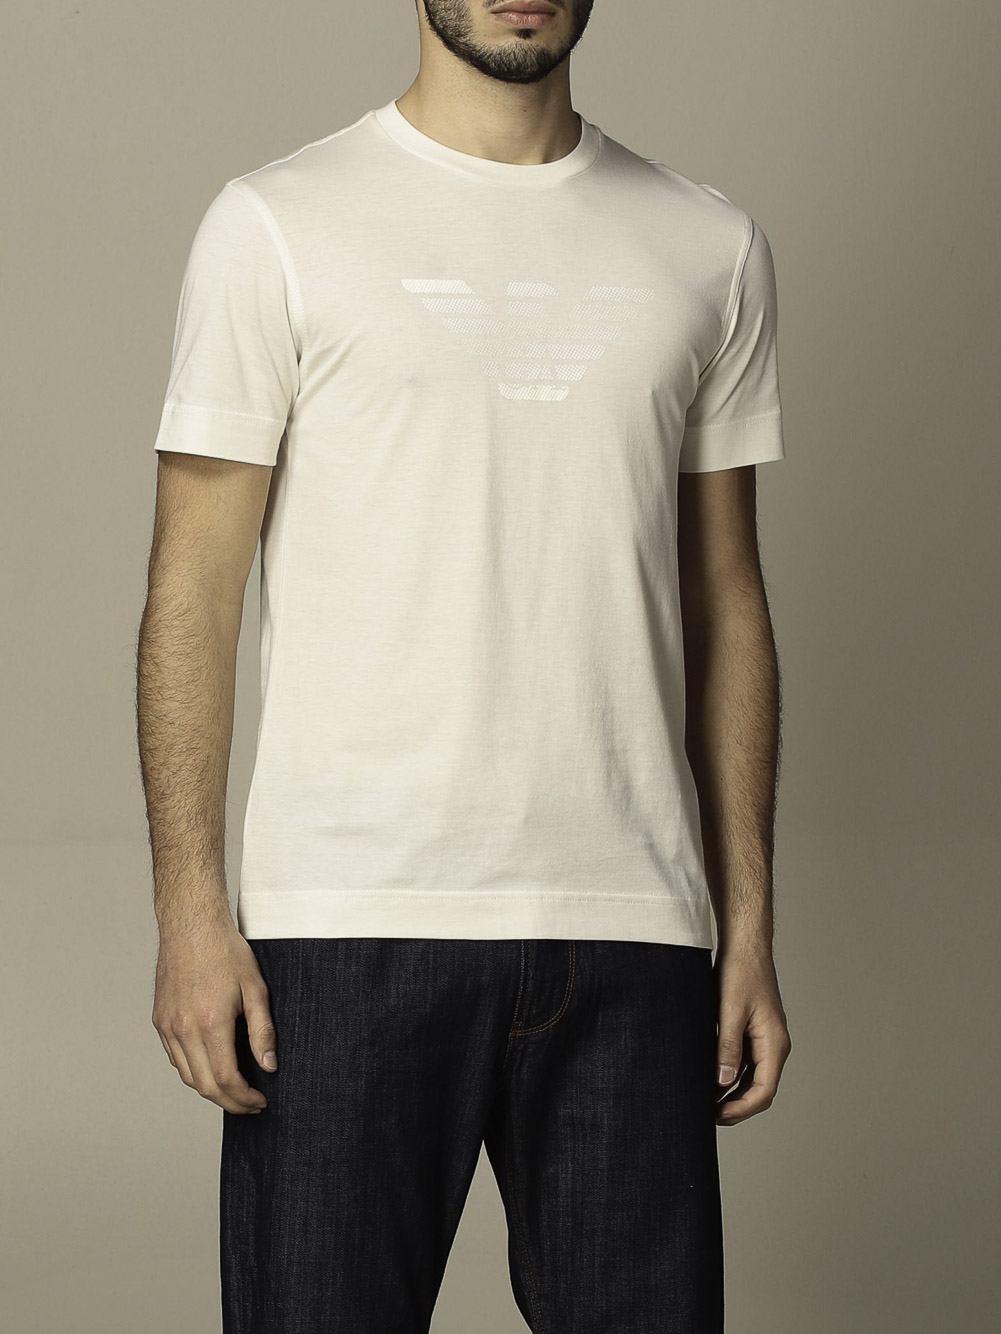 EMPORIO ARMANI Μπλούζα t-shirt 3K1TE61JSHZ-0101 ΕΚΡΟΥ